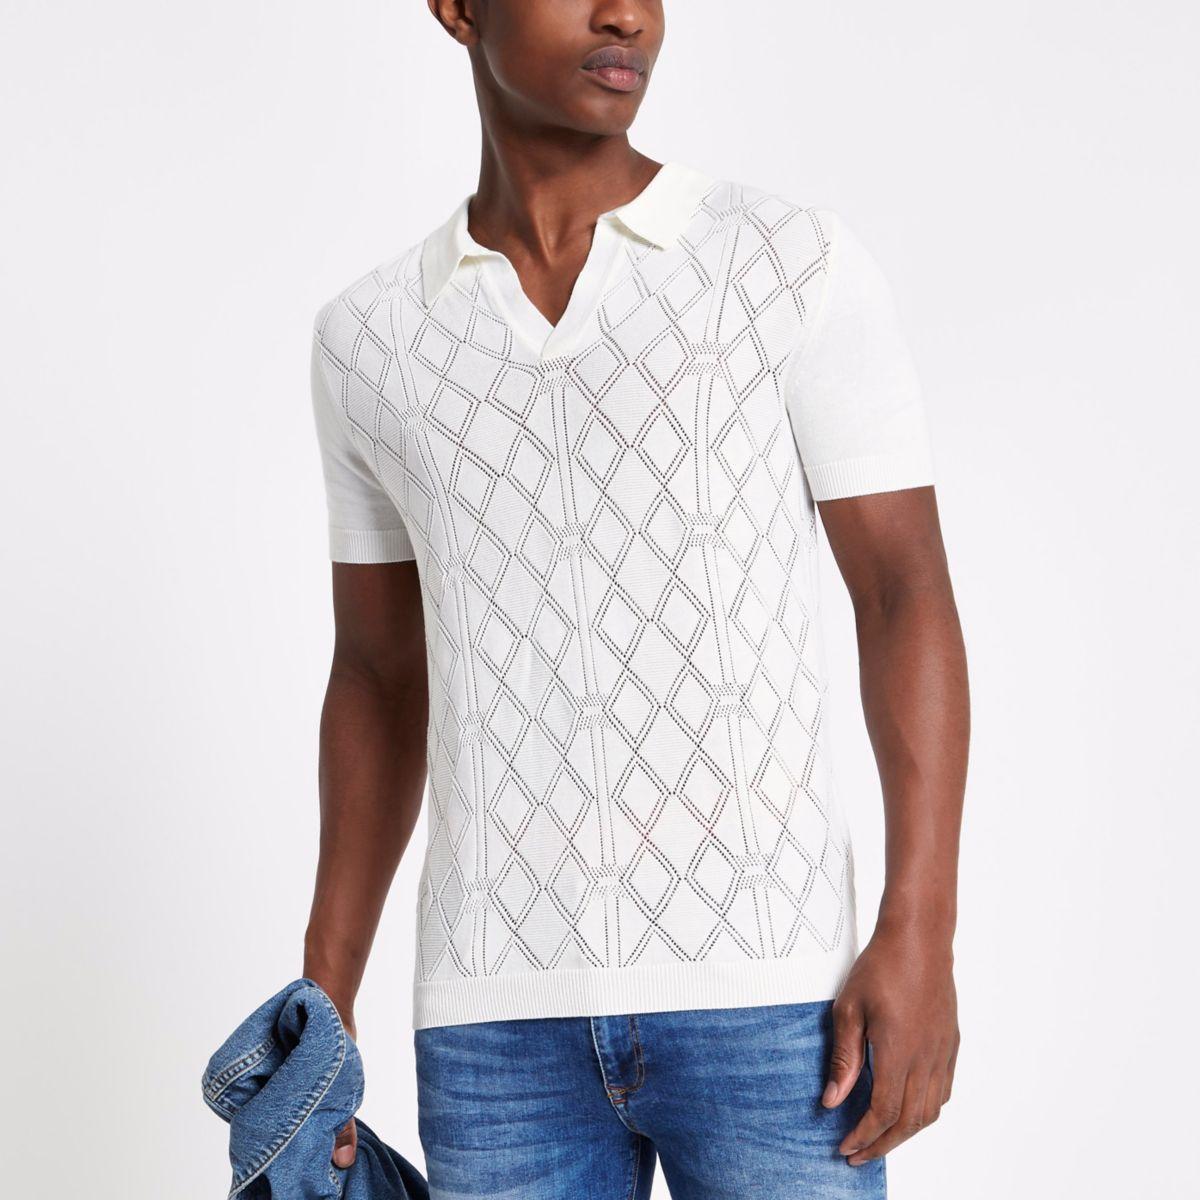 Slim Fit Poloshirt in Ecru